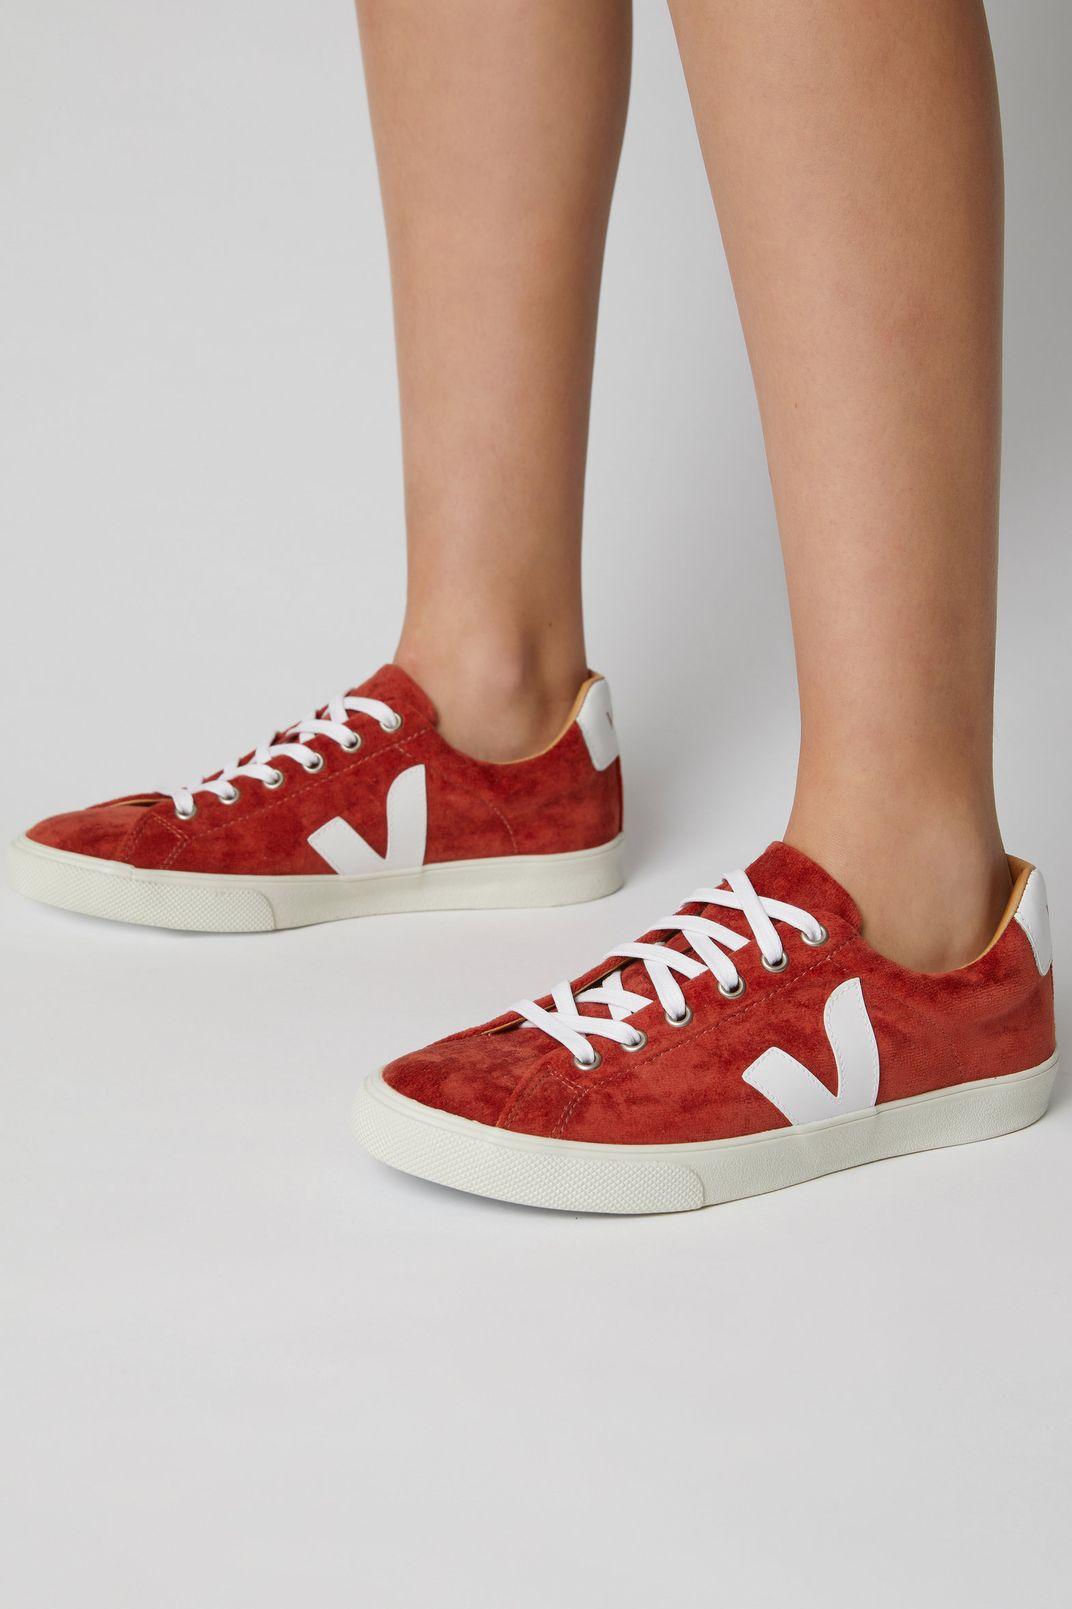 Veja Esplar Leather-Trimmed Suede Sneakers